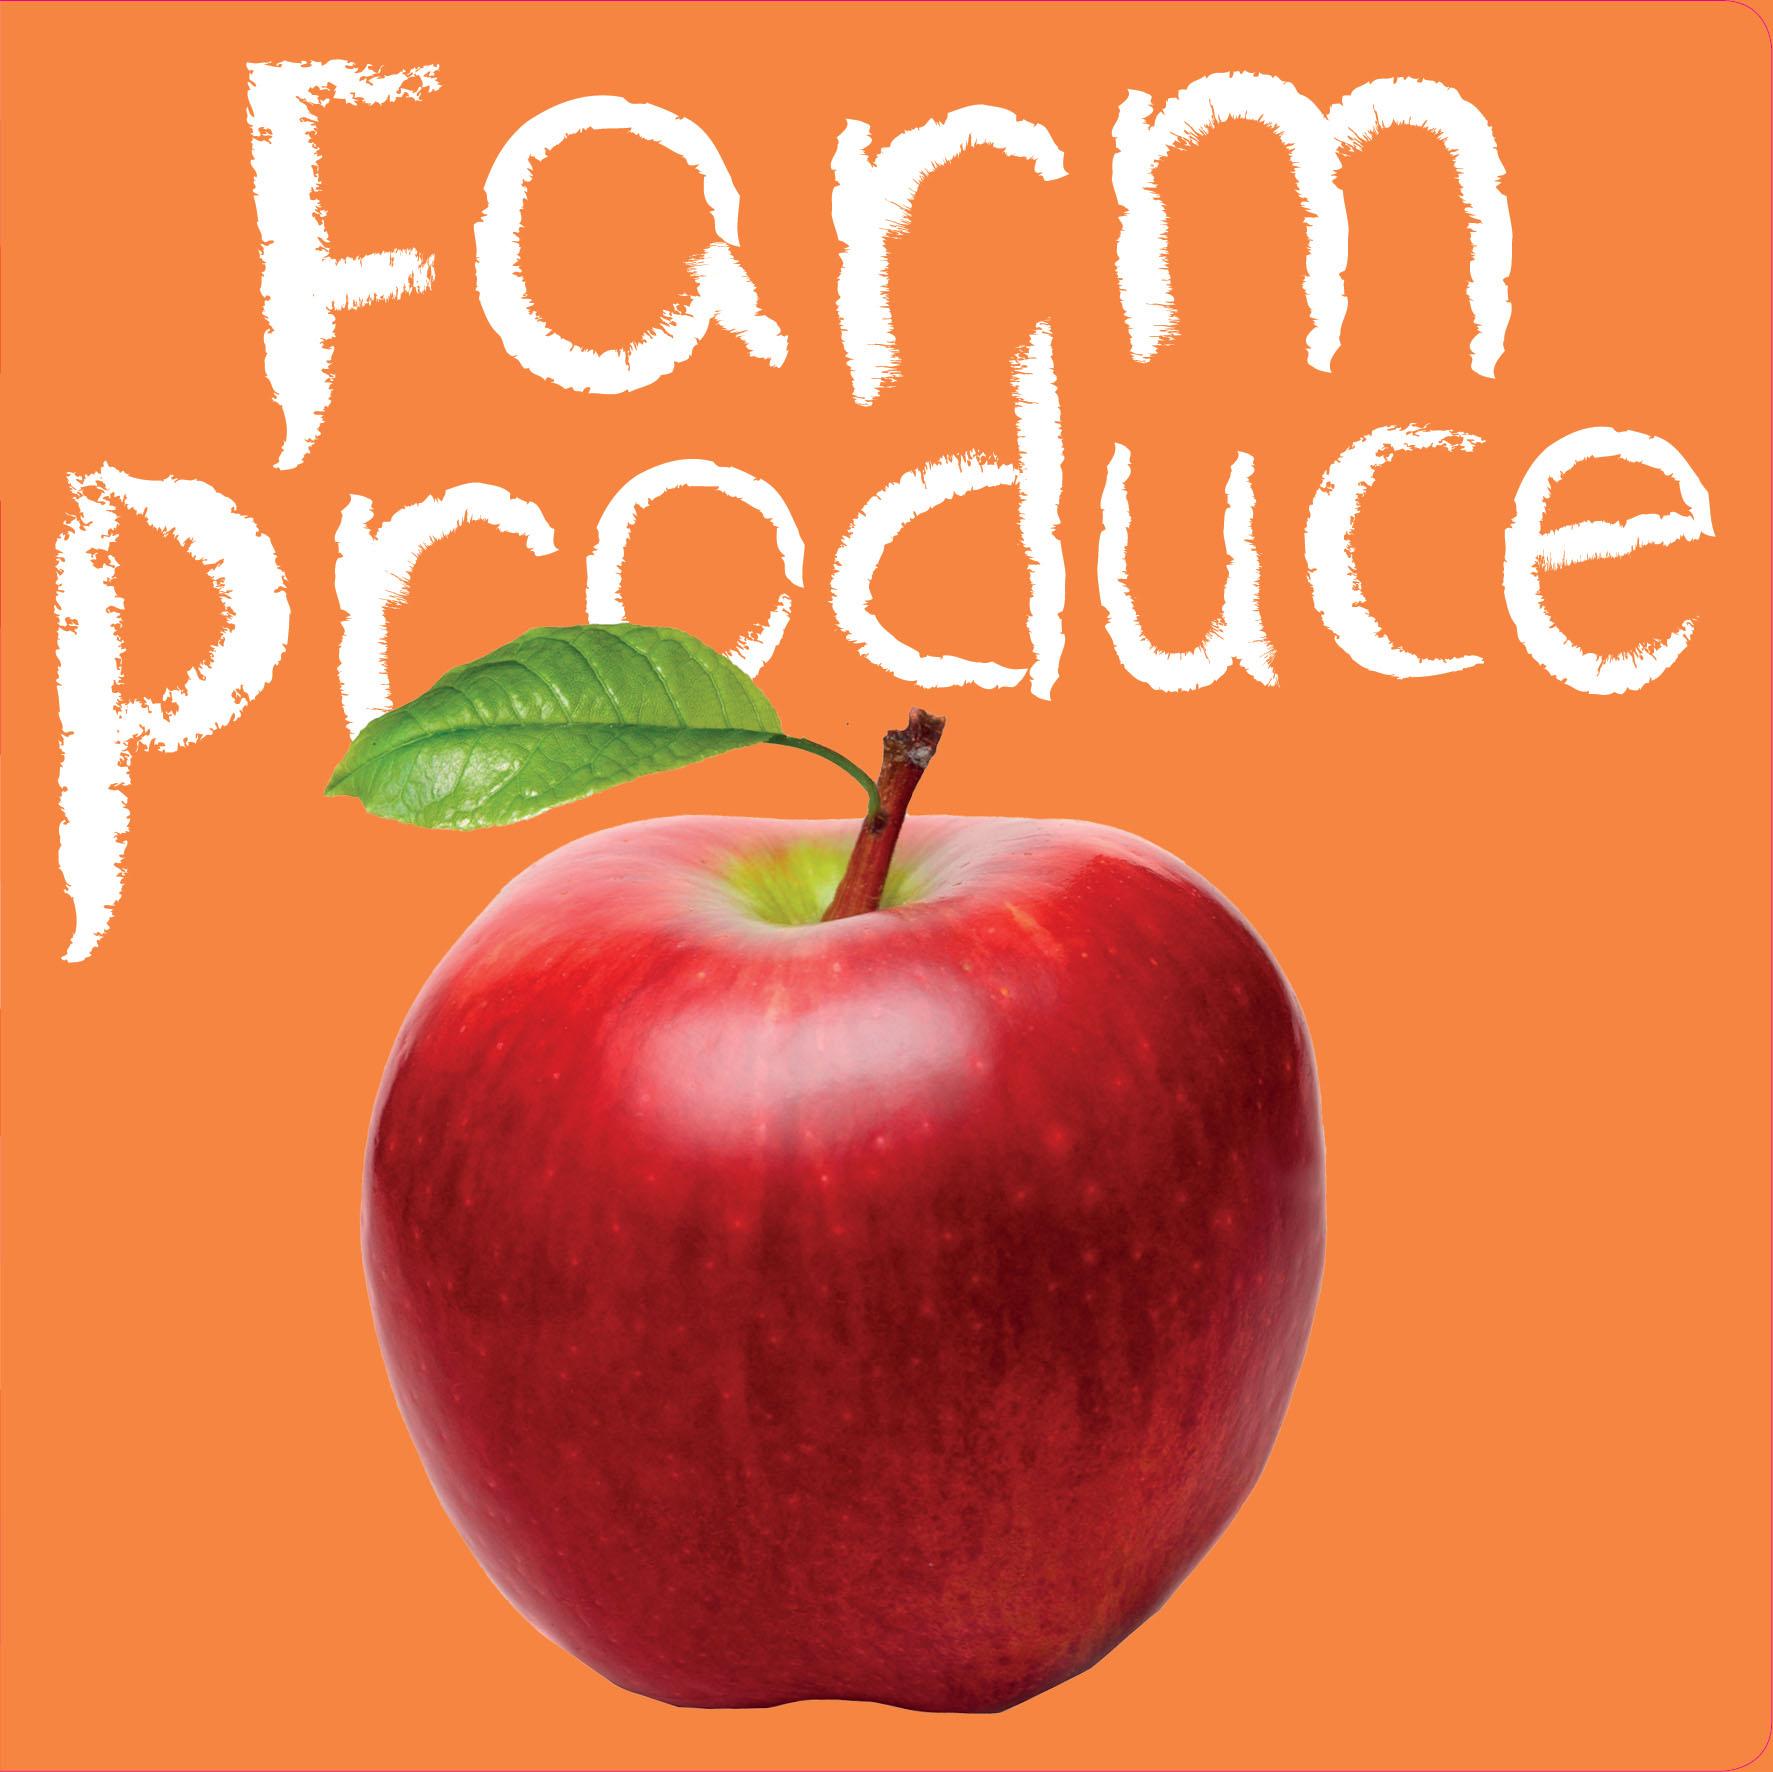 Farm mini library_FarmProduce cvr4